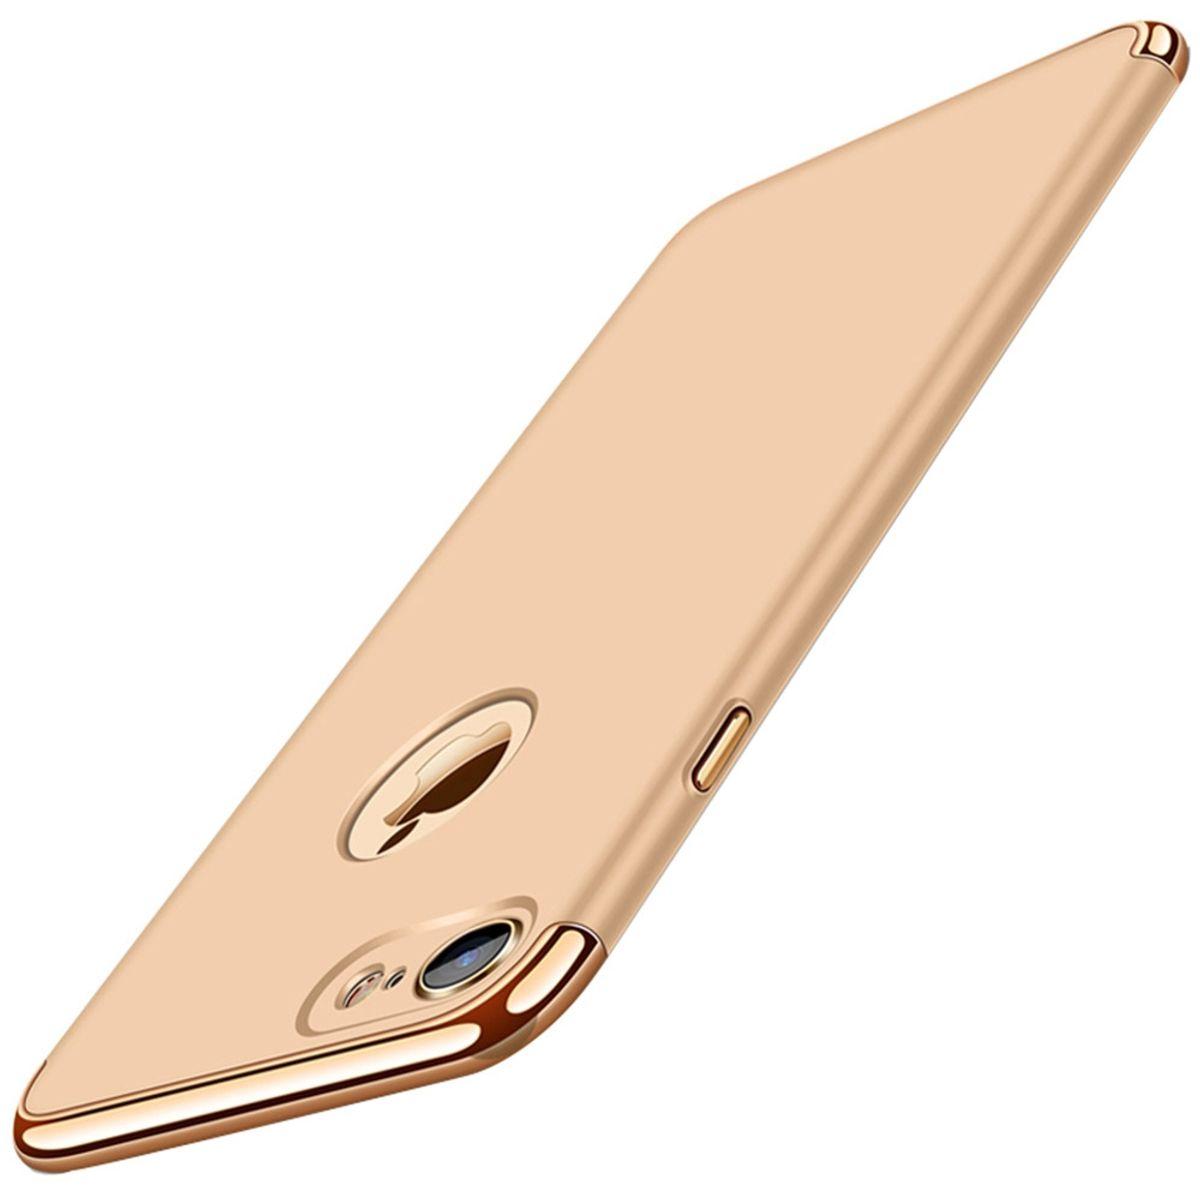 Handy Hülle Schutz Case für Apple iPhone 8 Bumper 3 in 1 Cover Chrom Etui Gold